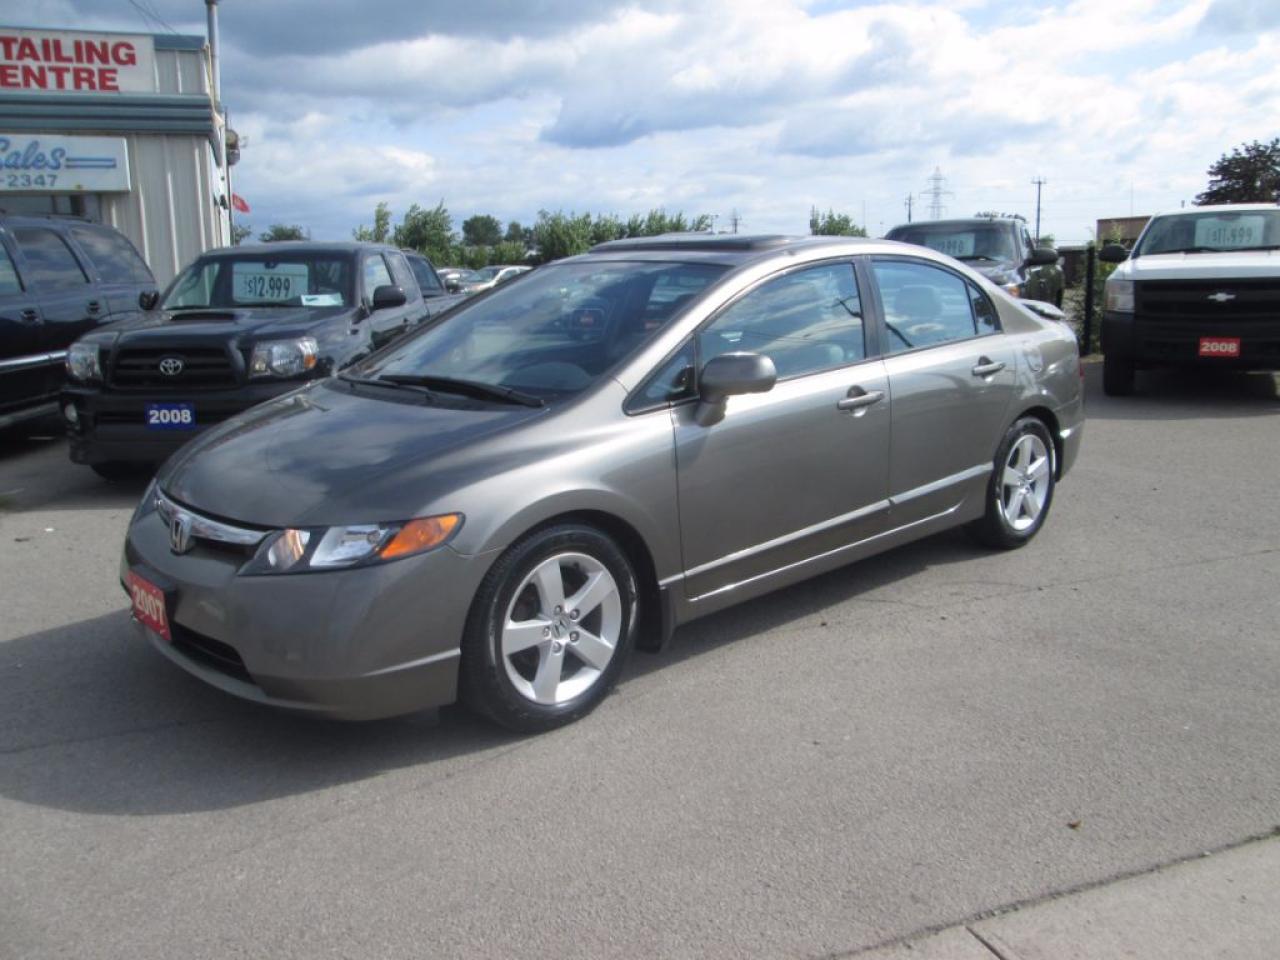 Photo of Gray 2007 Honda Civic